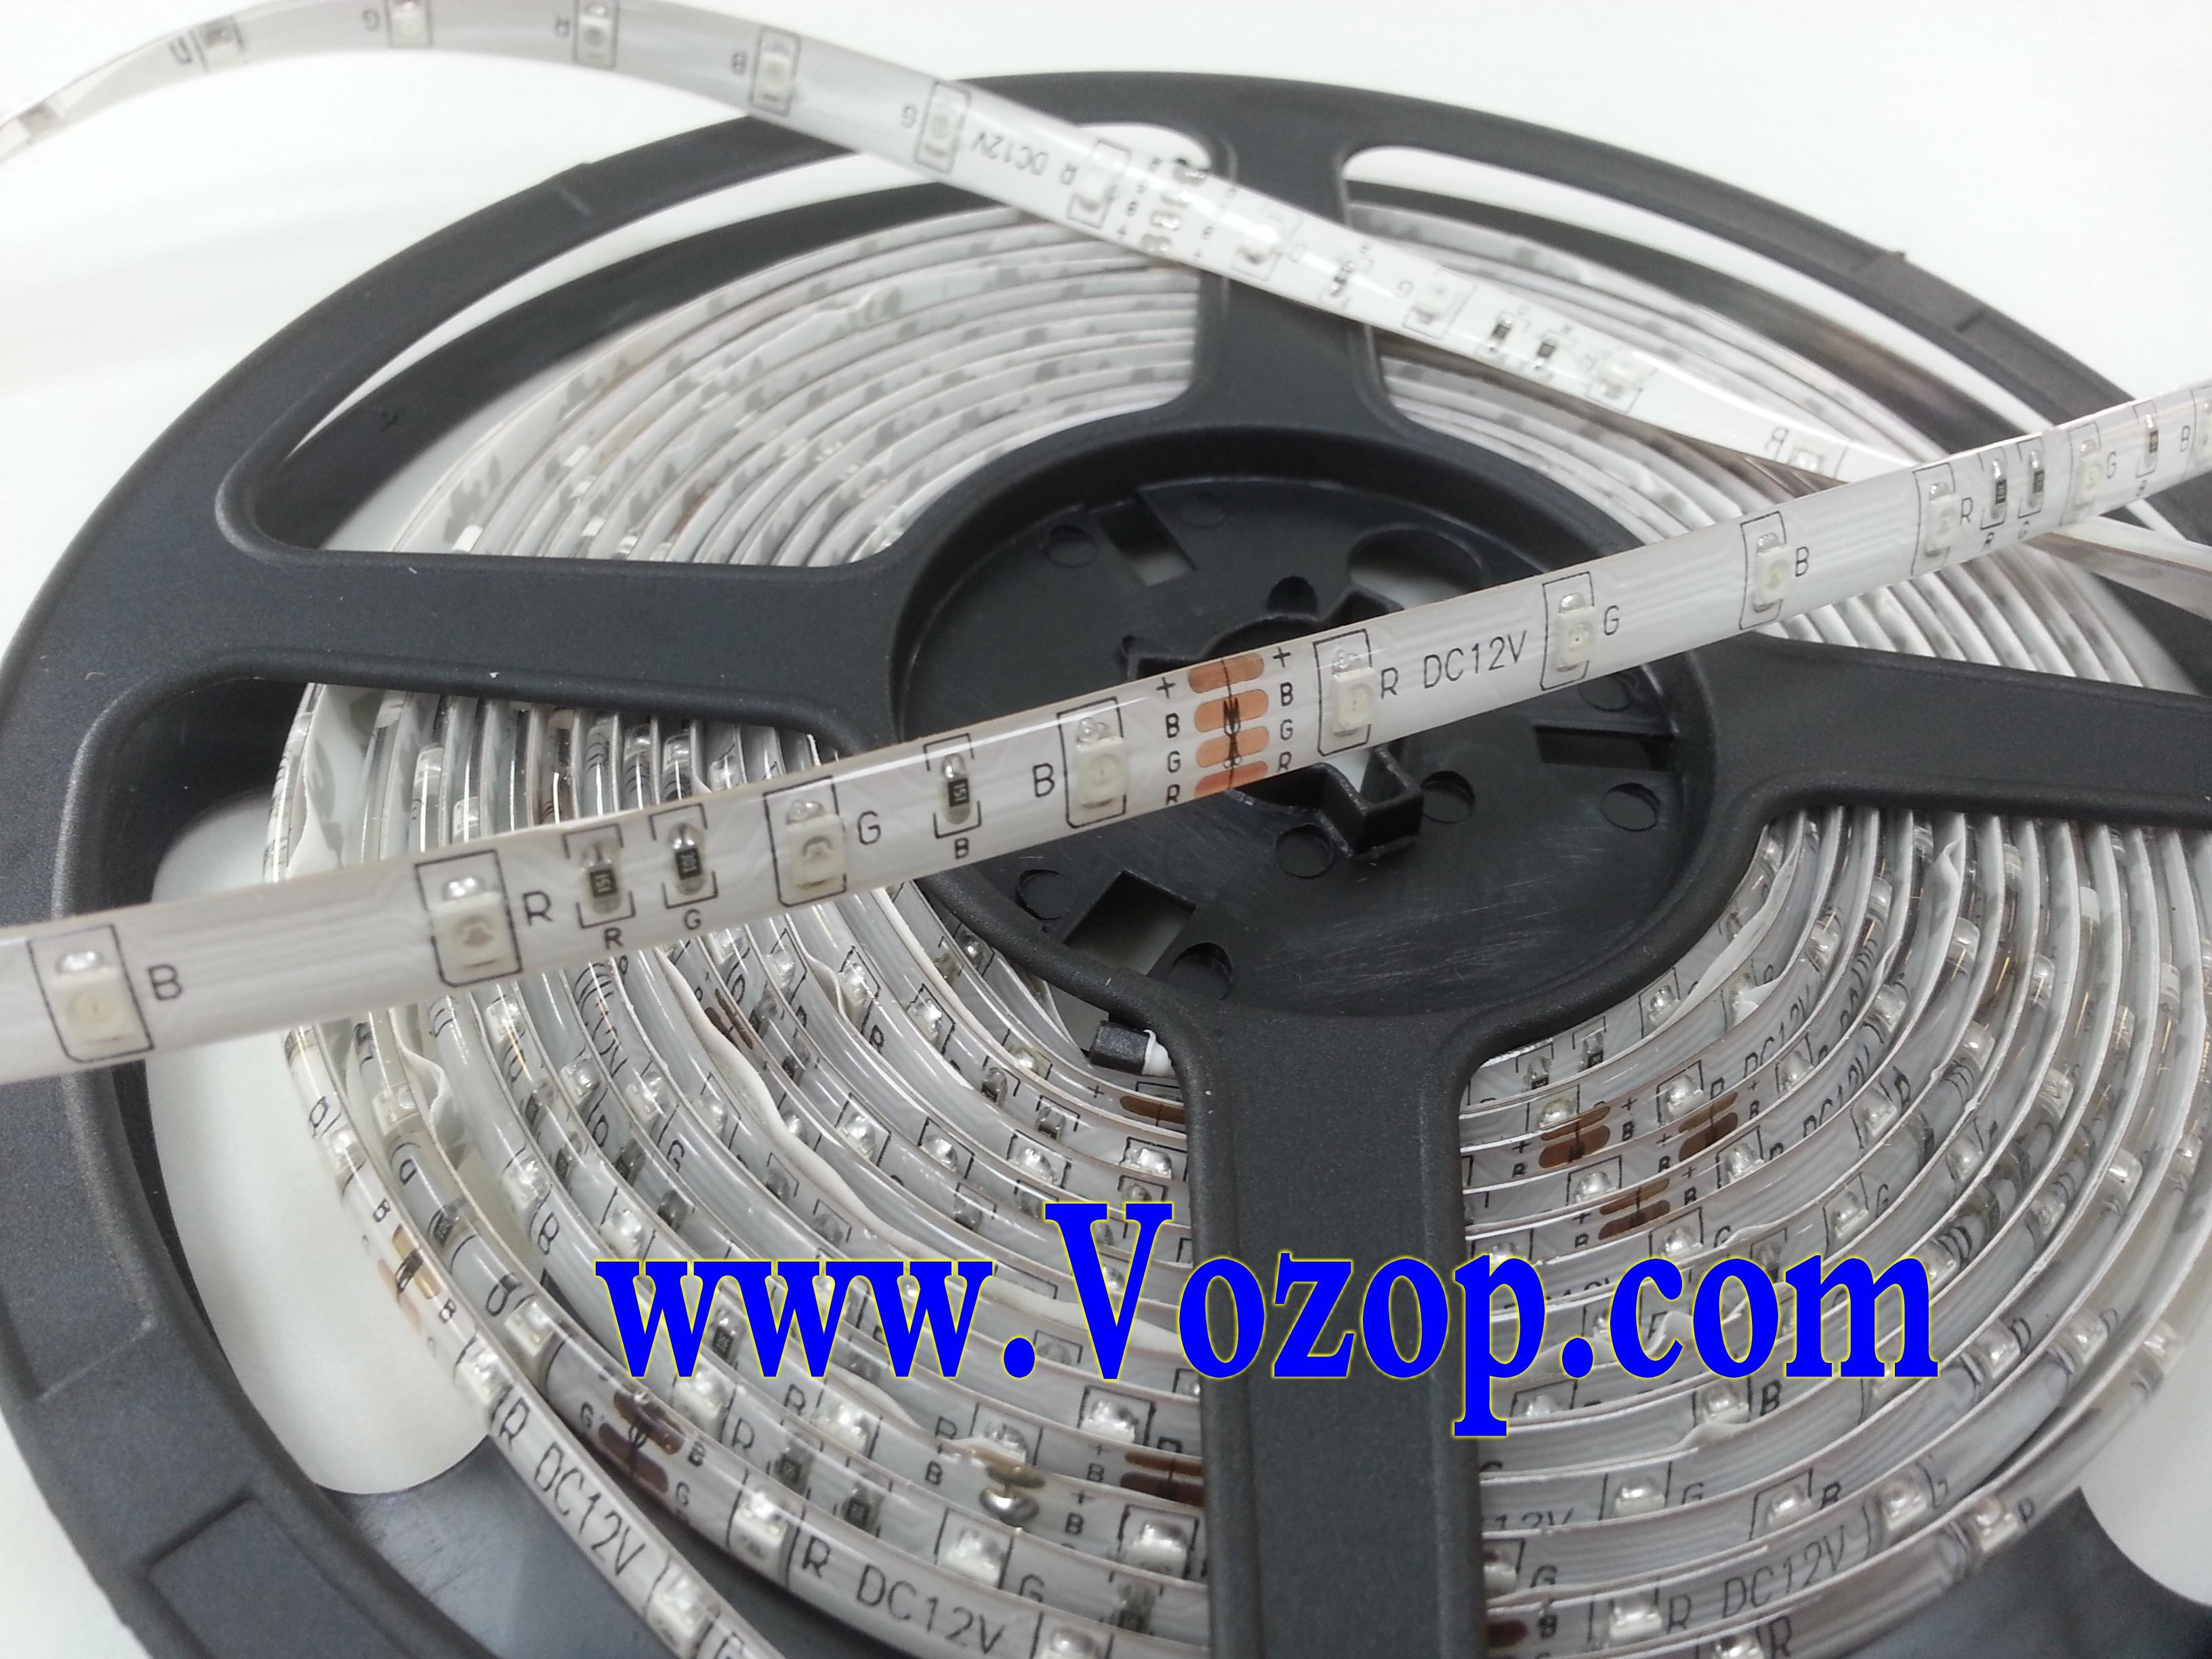 RGB_SMD_3528_LED_tape_Strip_5M_300_LEDs_IP65_Waterproof_lighting_light